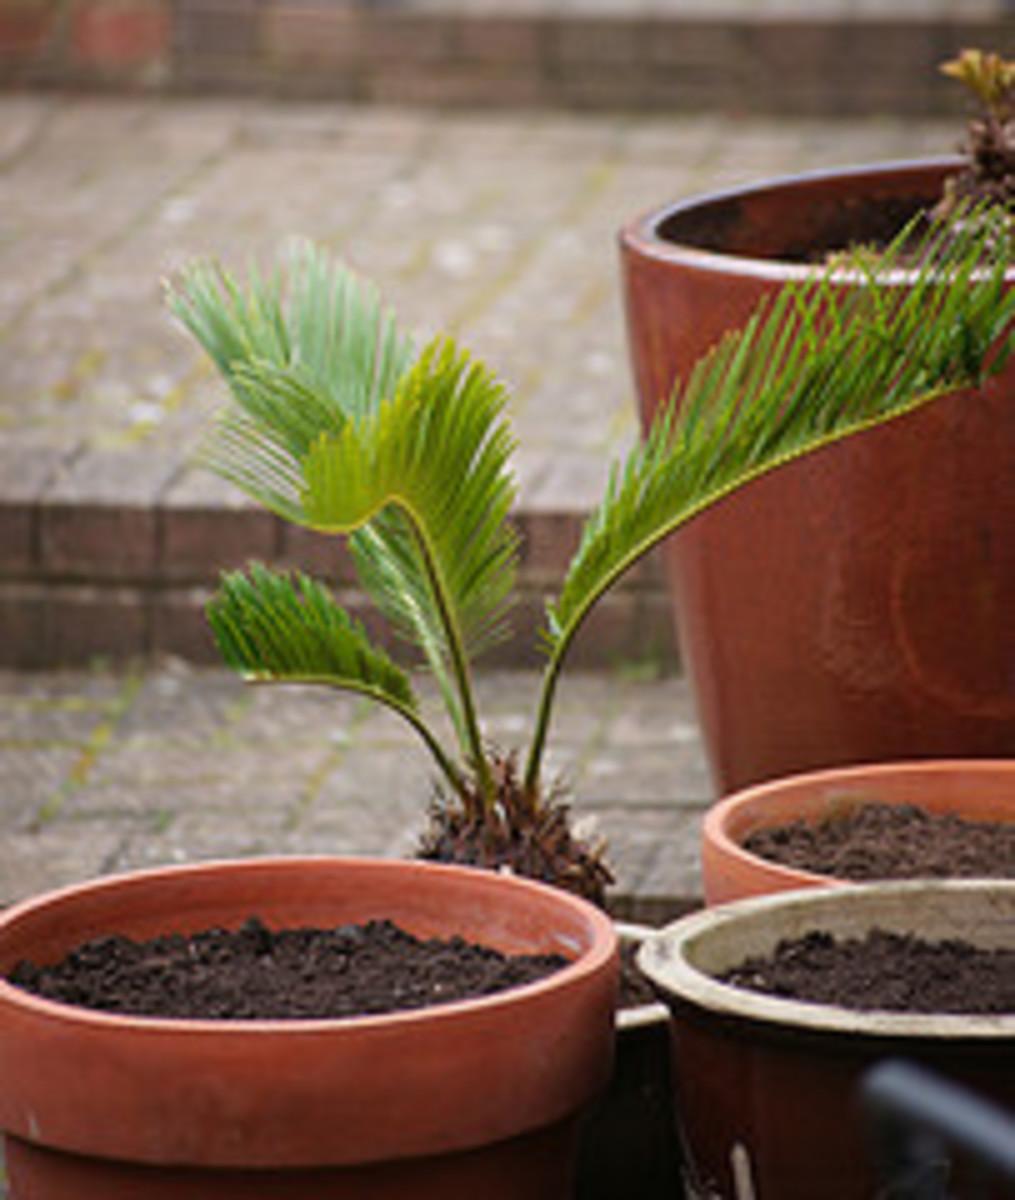 pots with potting soil